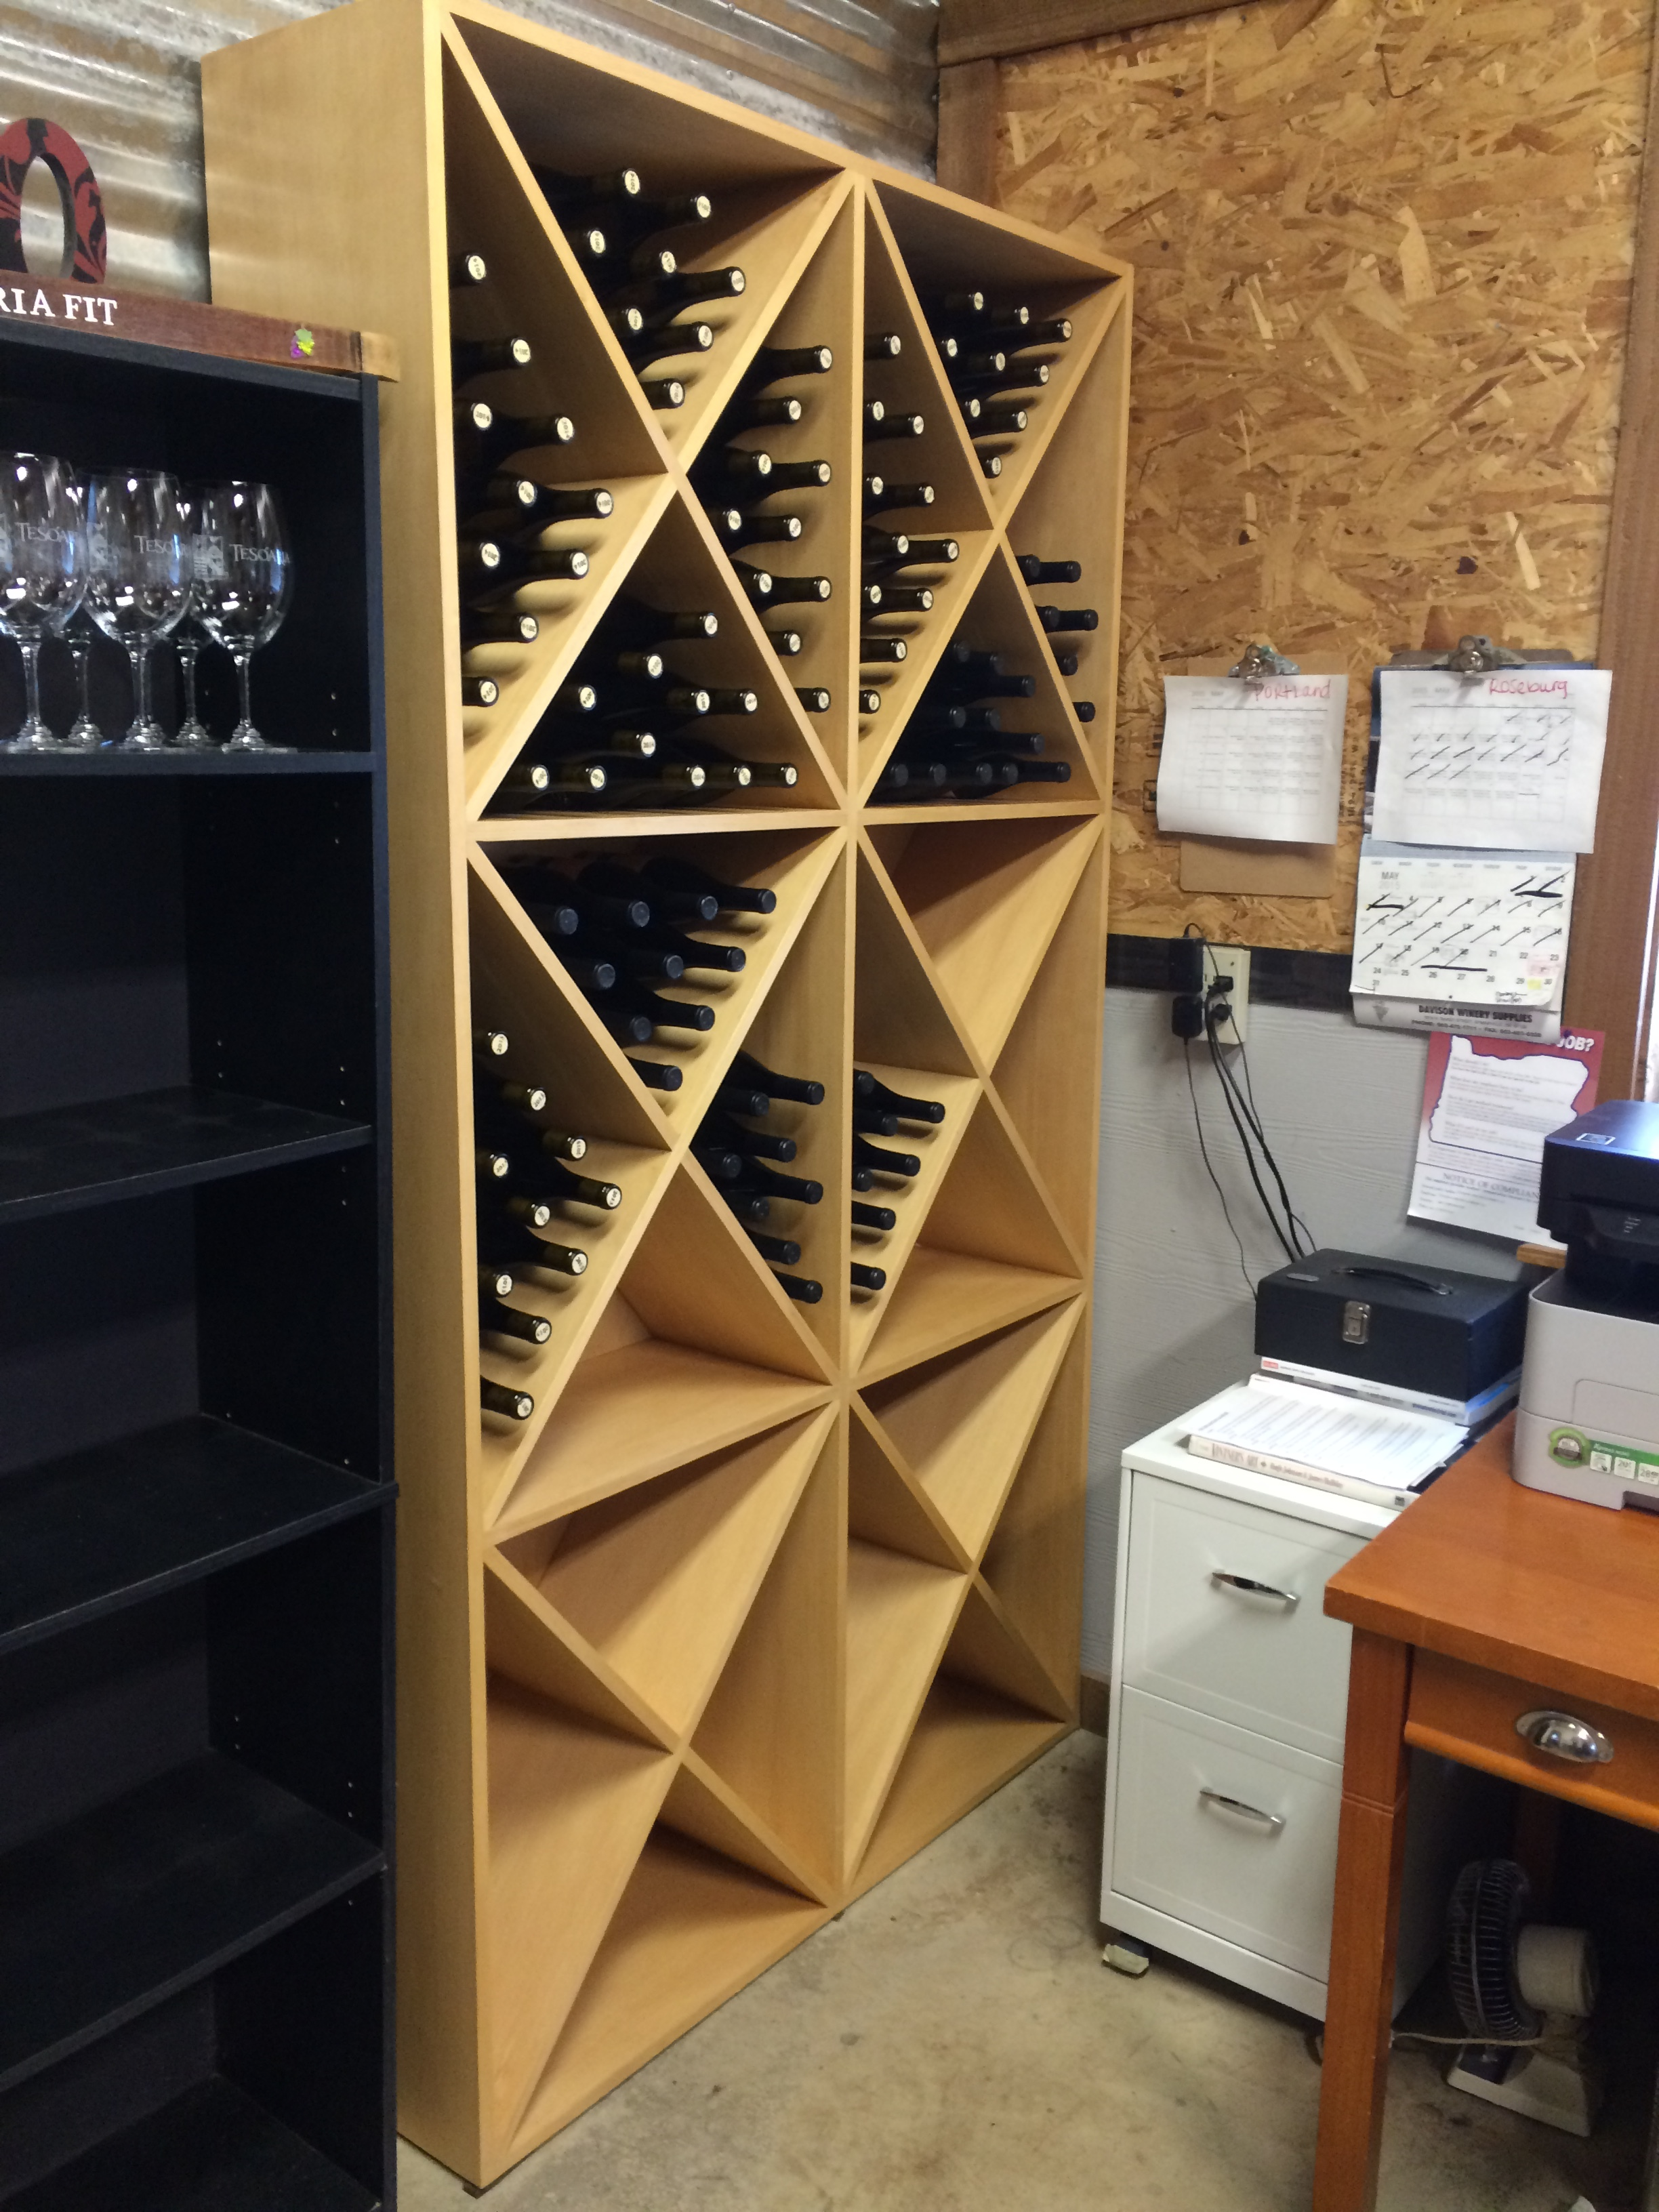 Douglas fir diamond wine rack at Roseburg winery.